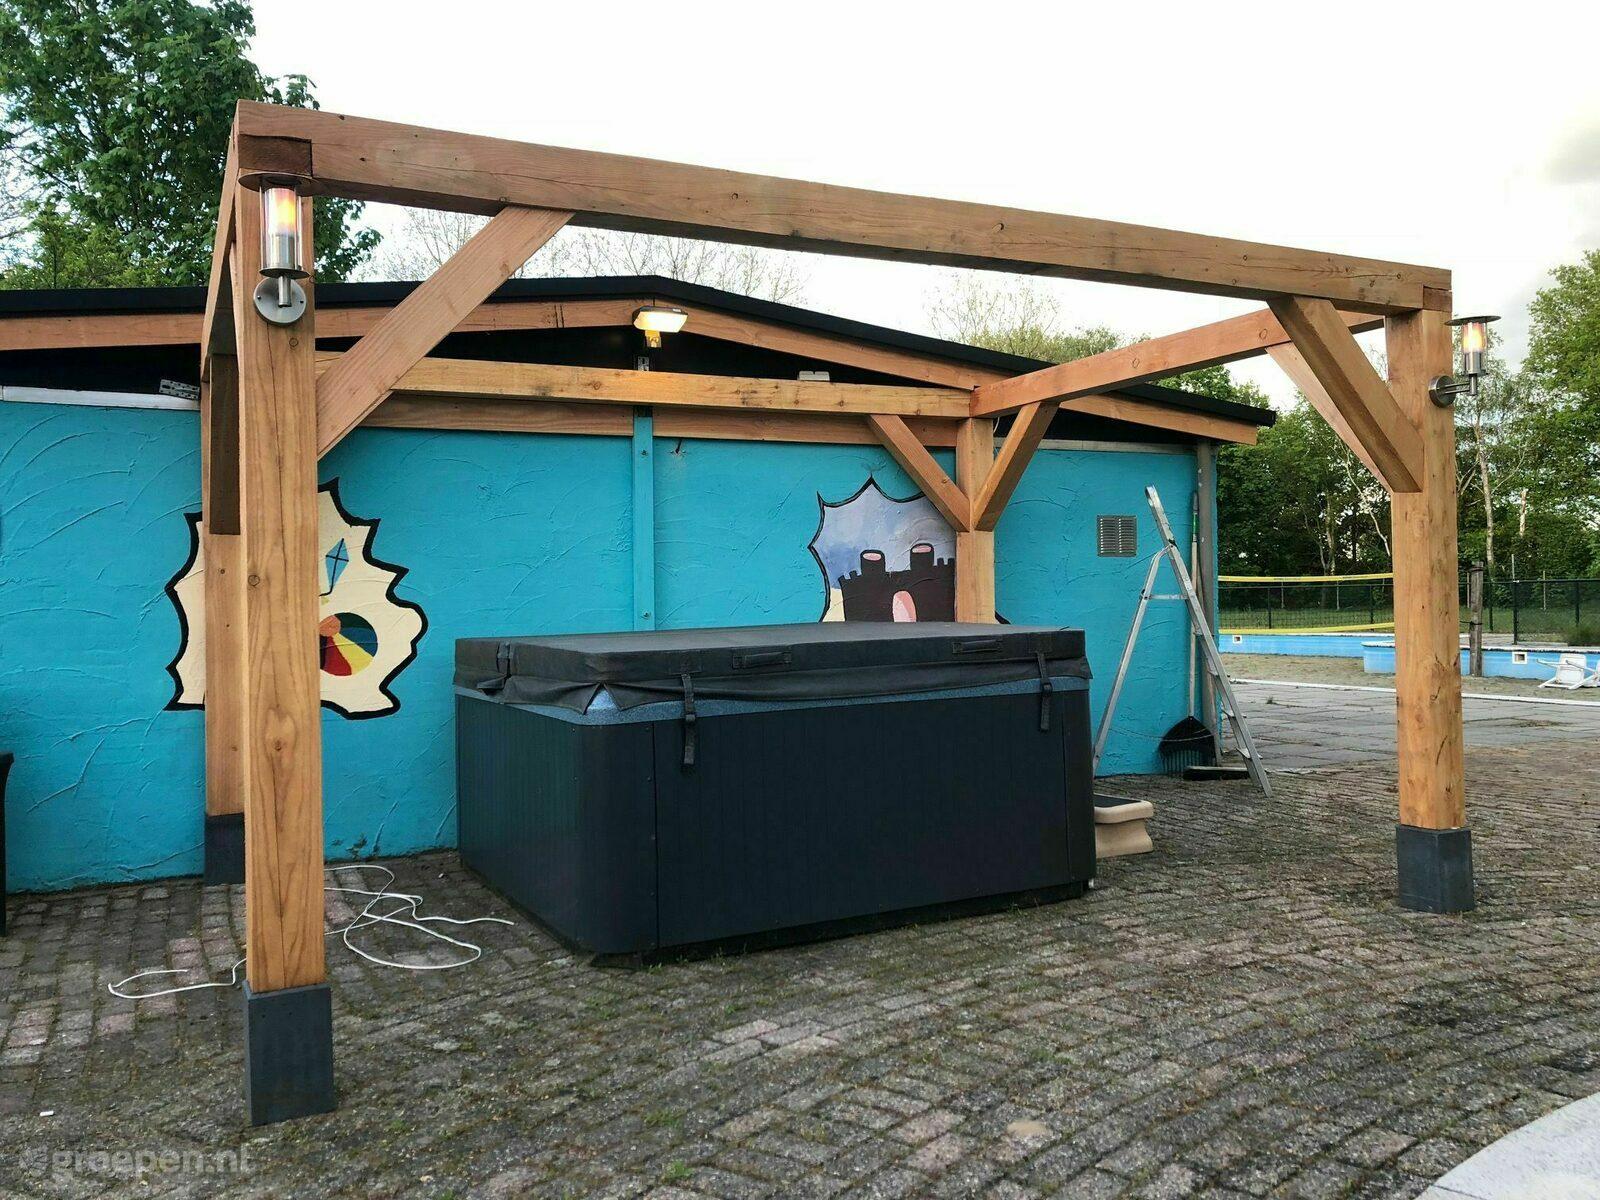 Groepsaccommodatie Heeswijks-Dinther